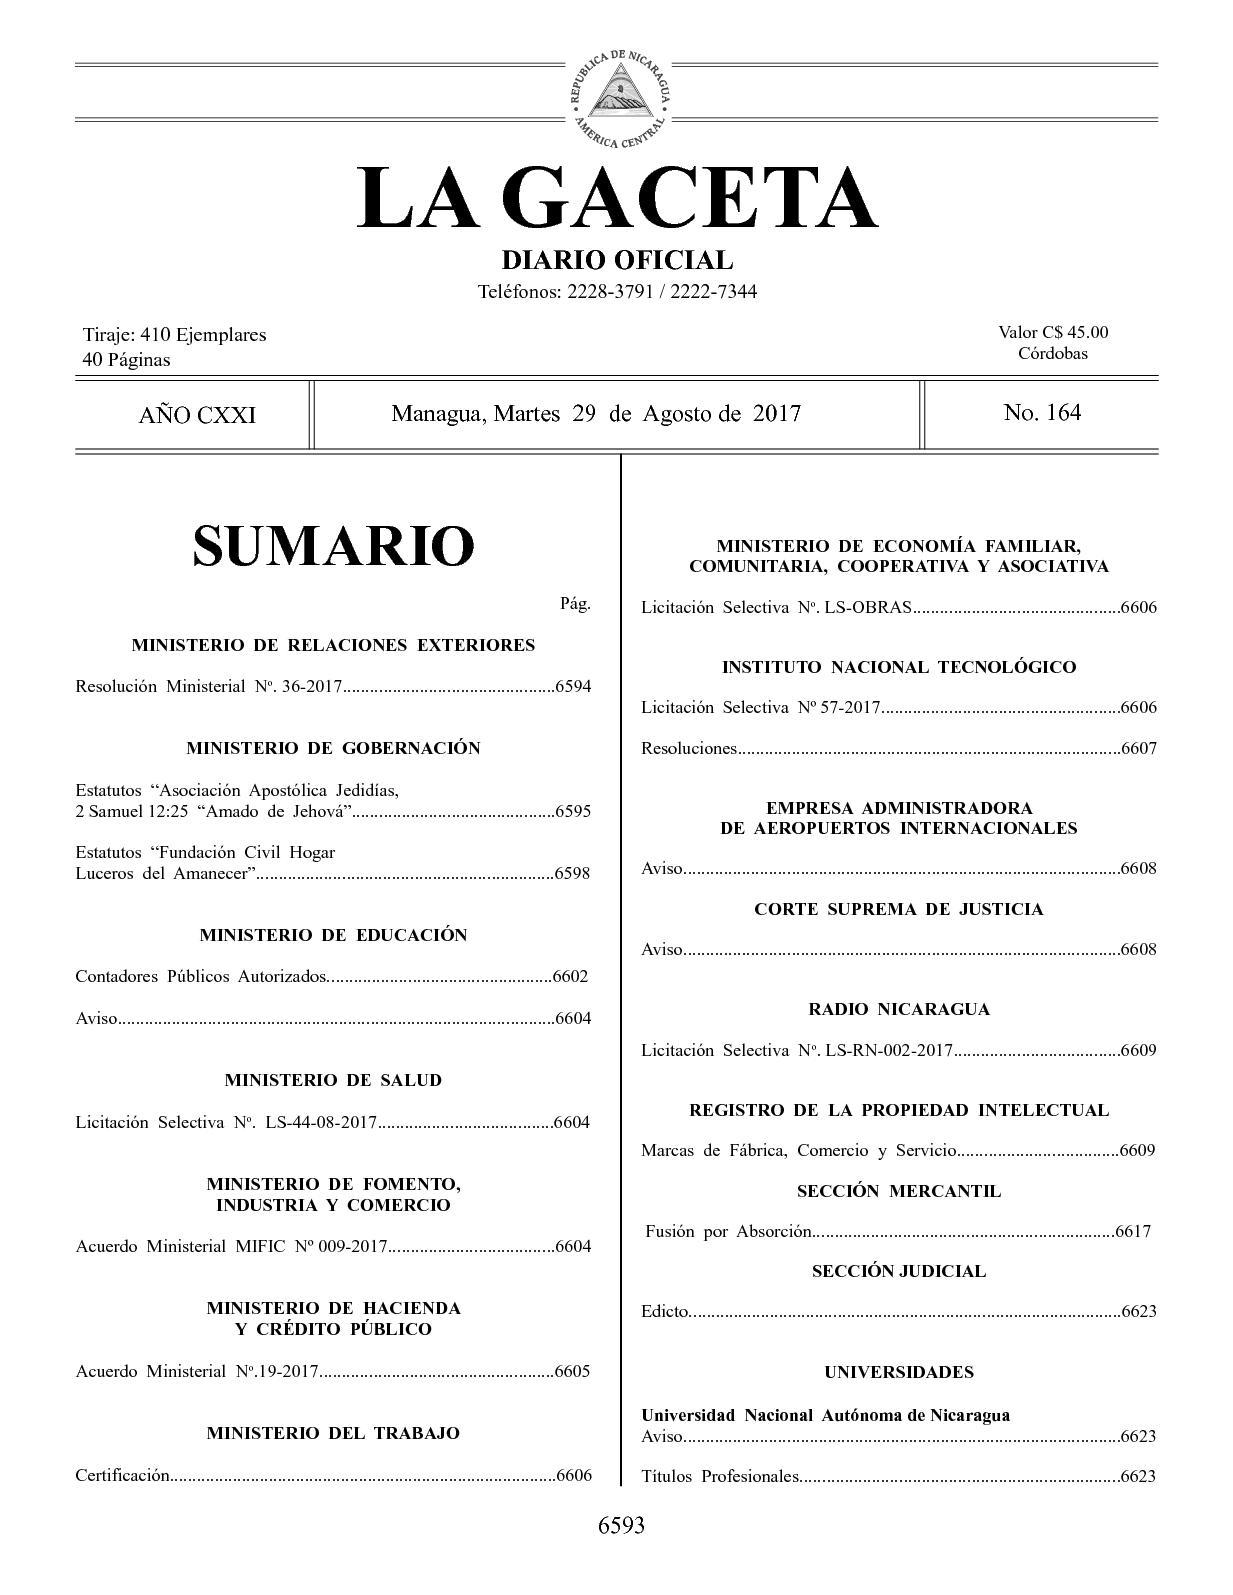 Gaceta No 164 Martes 29 De Agosto De 2017